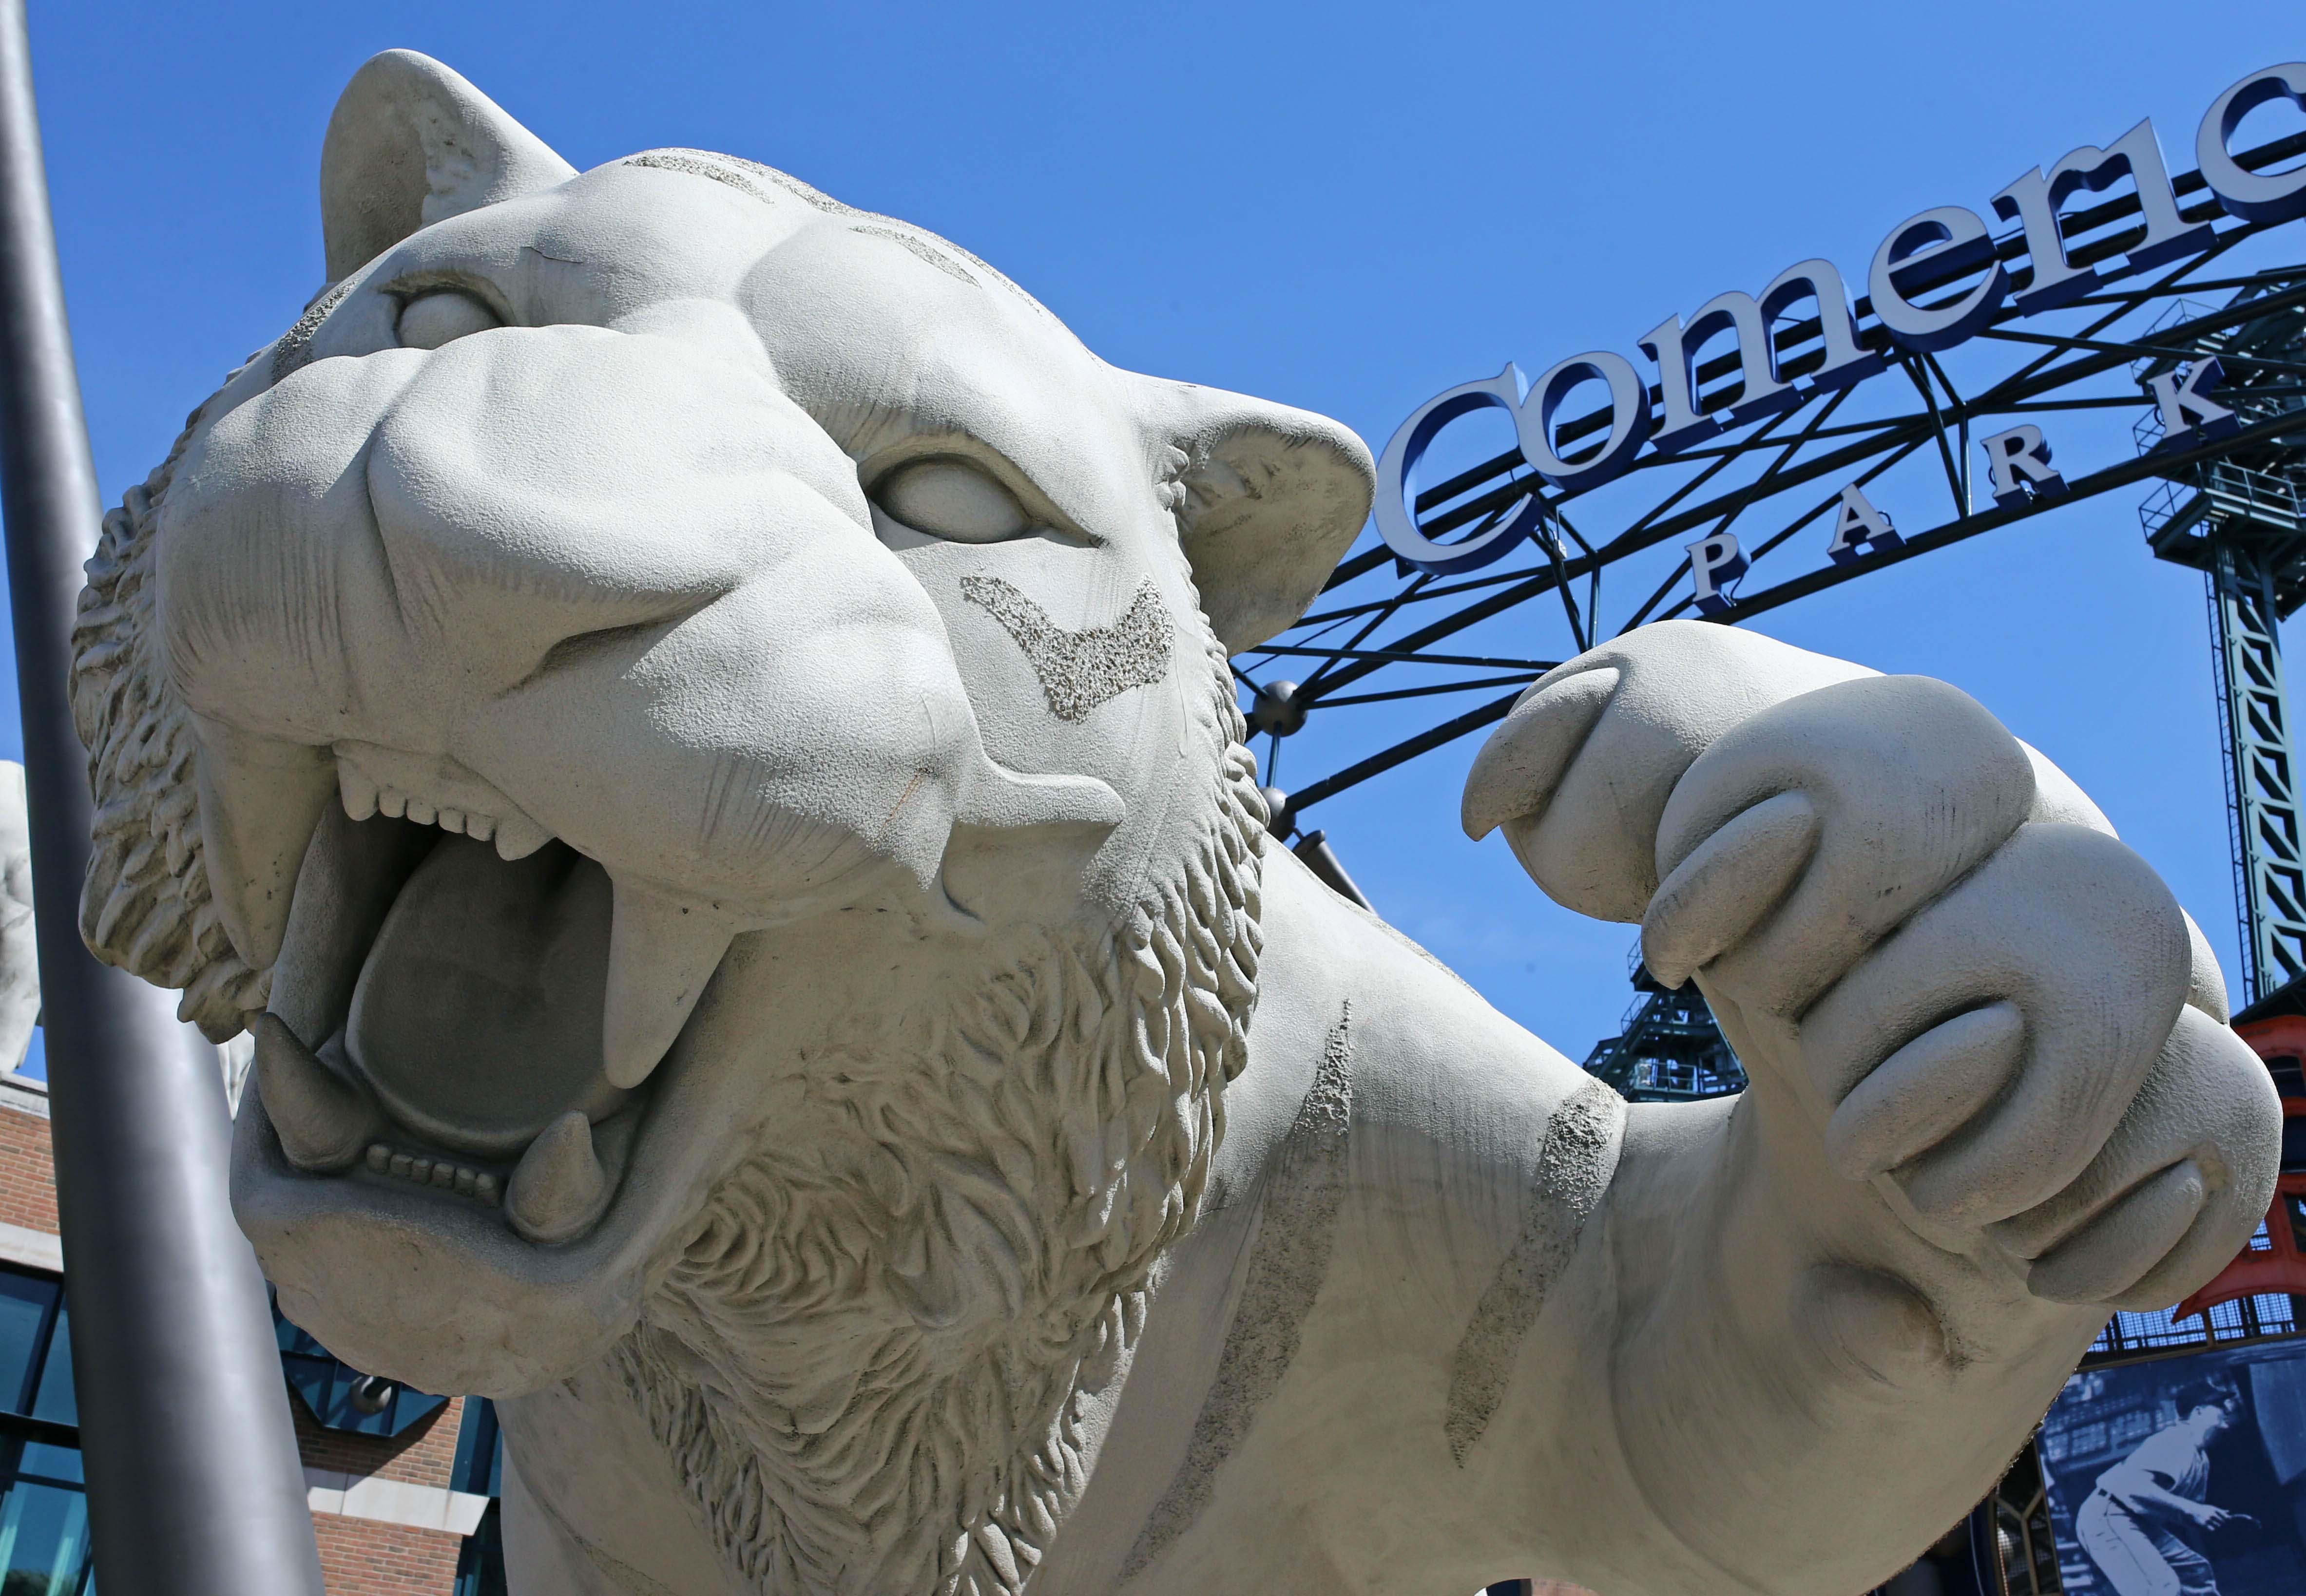 9276021-mlb-cleveland-indians-at-detroit-tigers